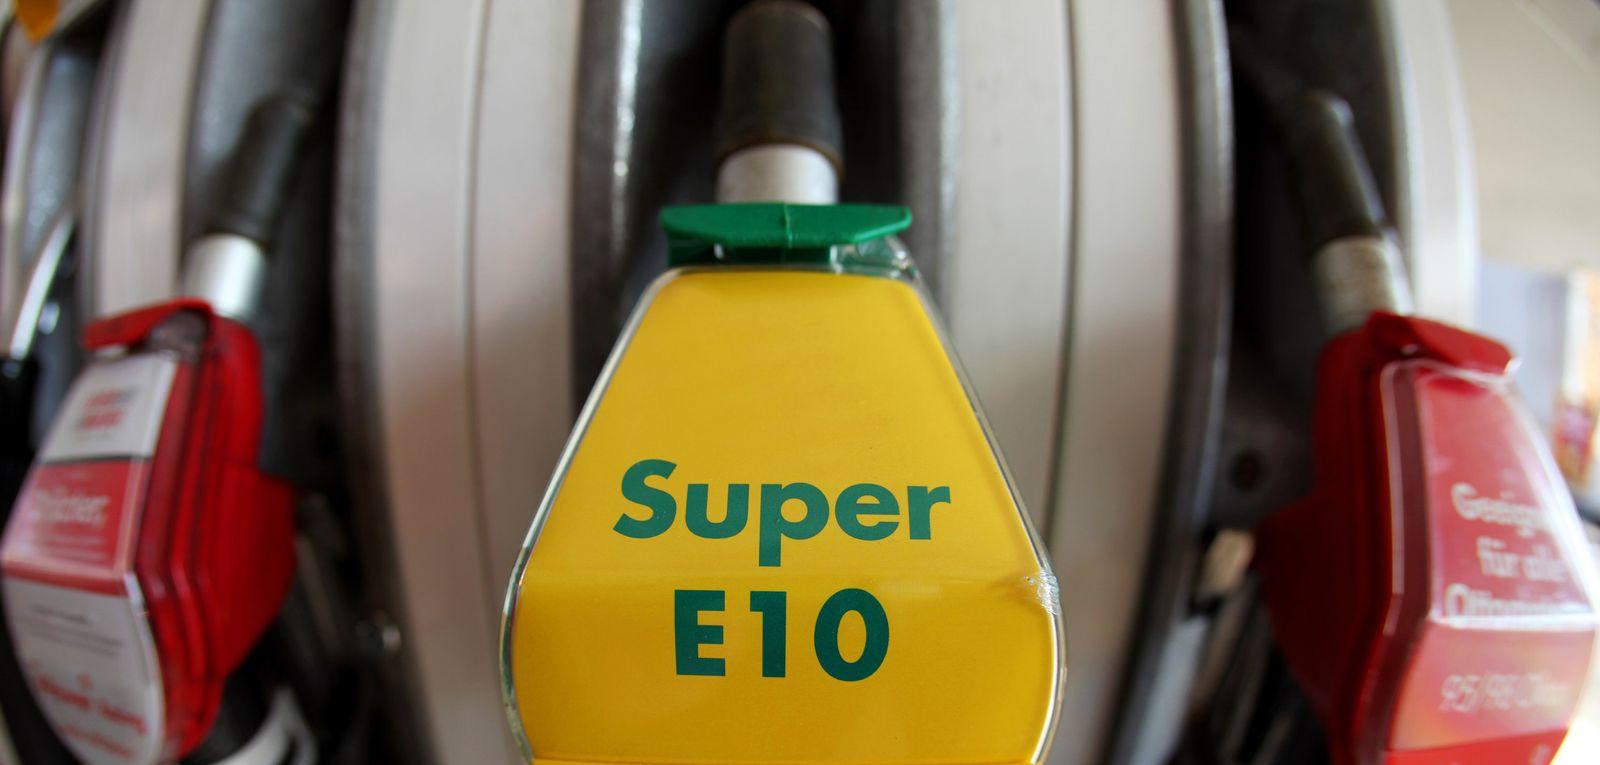 Benzin/ Biosprit/ E10